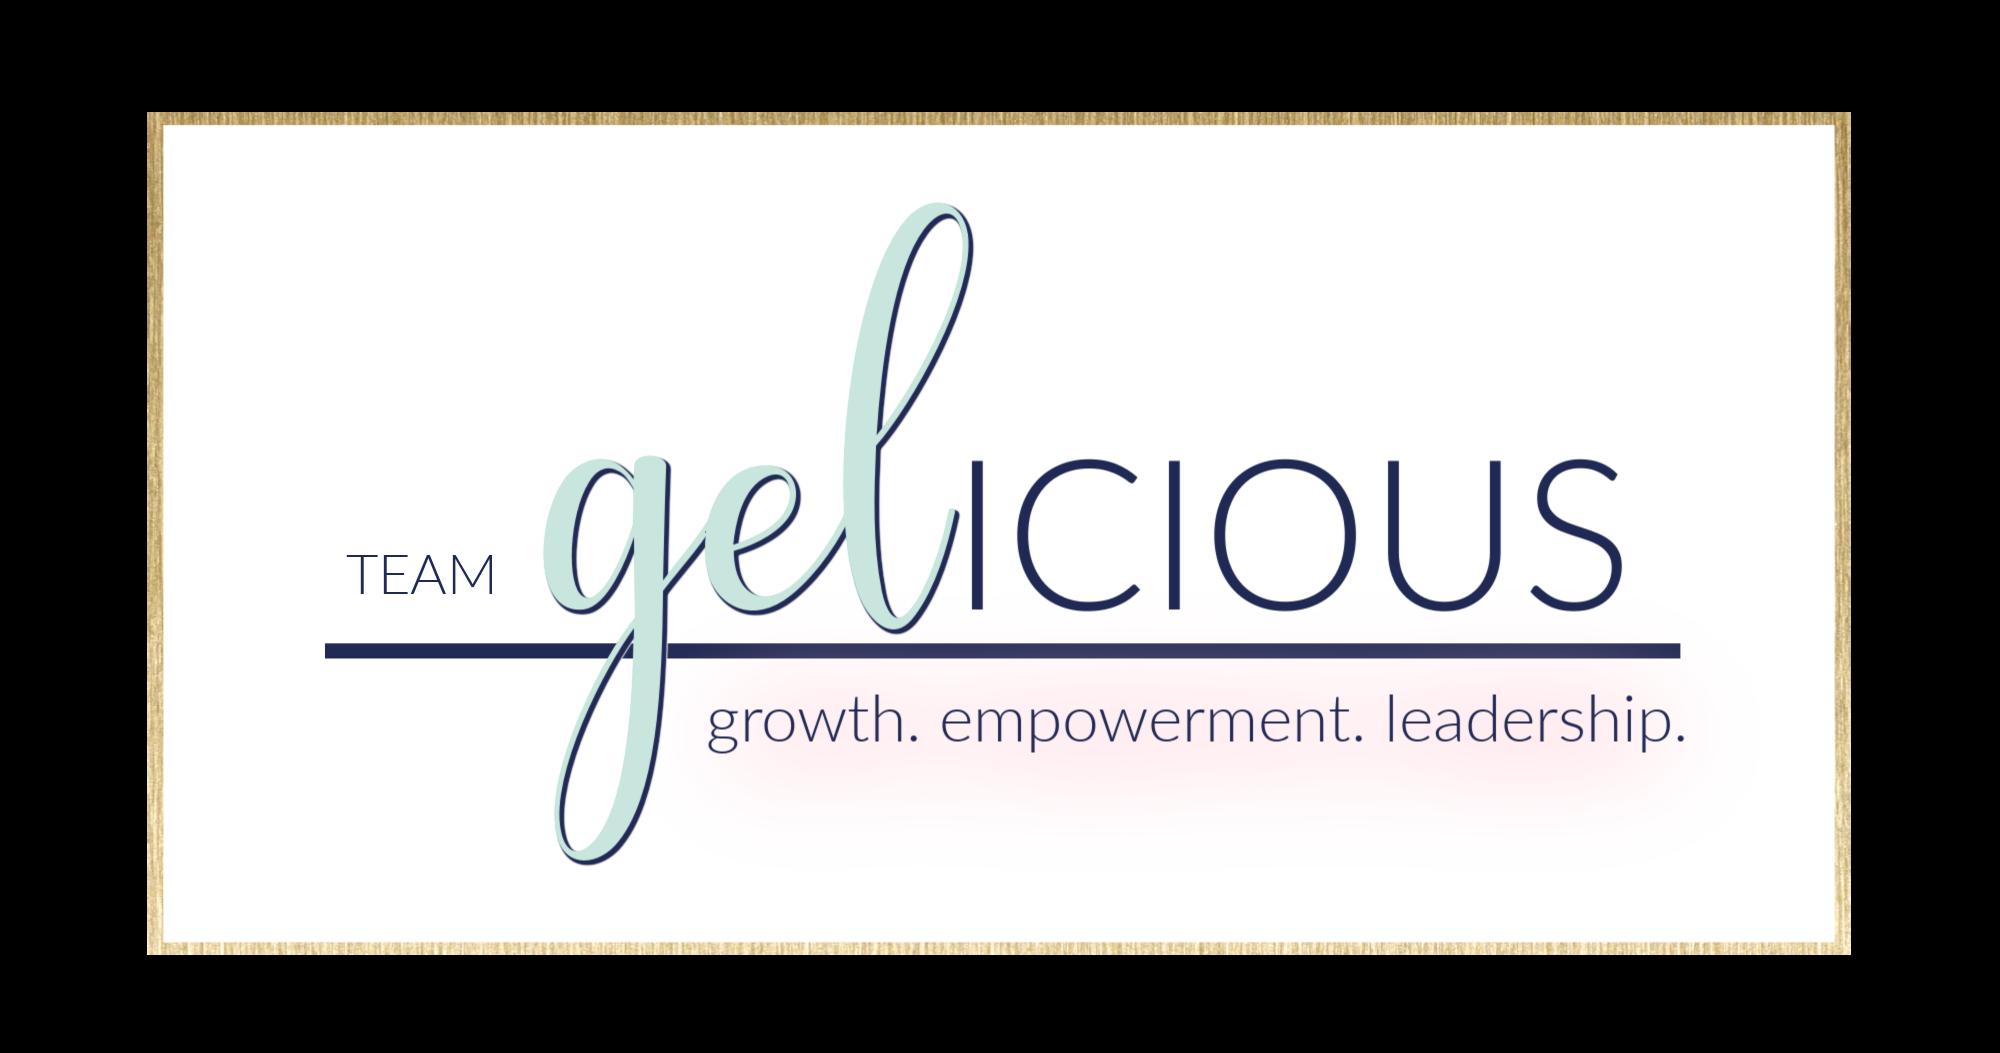 gelicious, team gelicious, so gelicious, naomi nails it, gelmoment, join gelmoment, gelmoment team, leadership, direct sales, ground floor